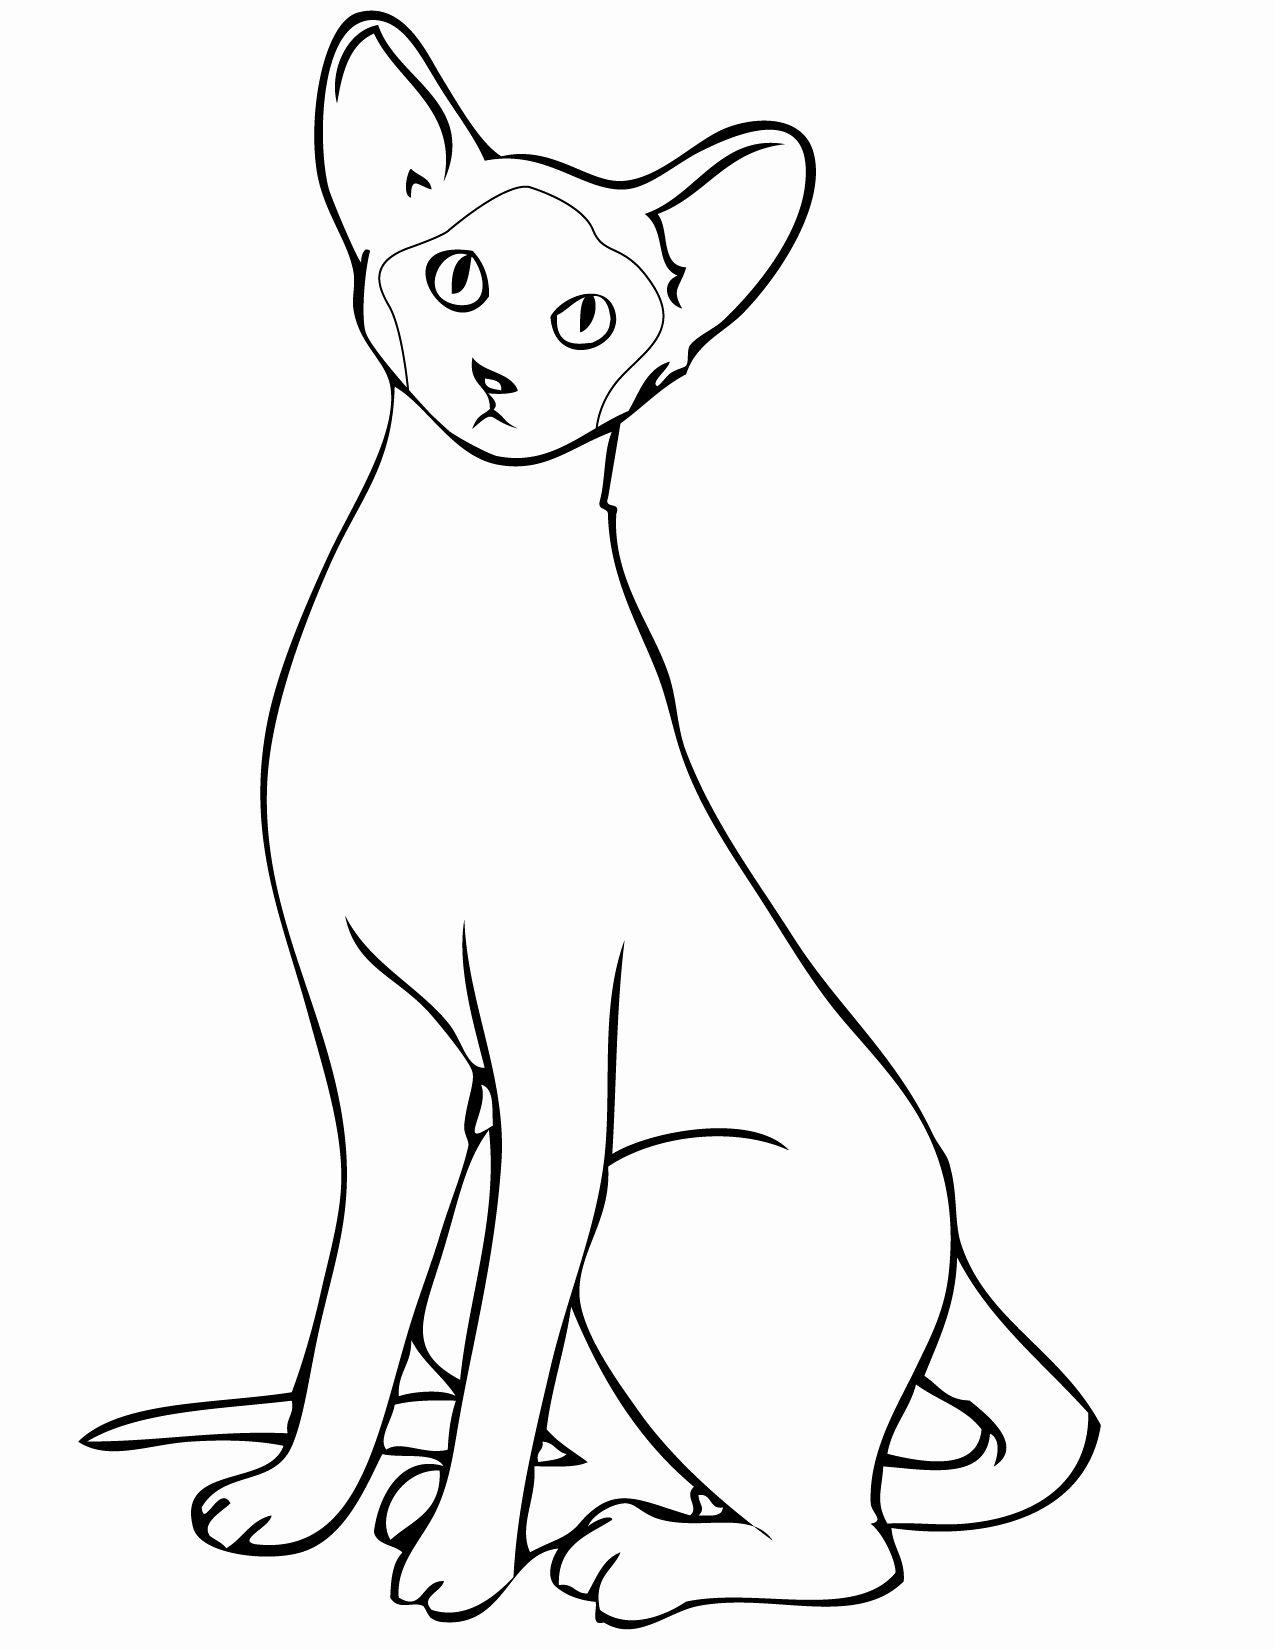 Cartoon Cat Coloring Pages Elegant Coloring Extraordinaryse Cat Coloring Pages Ideas Cat Coloring Page Cat Coloring Book Cartoon Coloring Pages